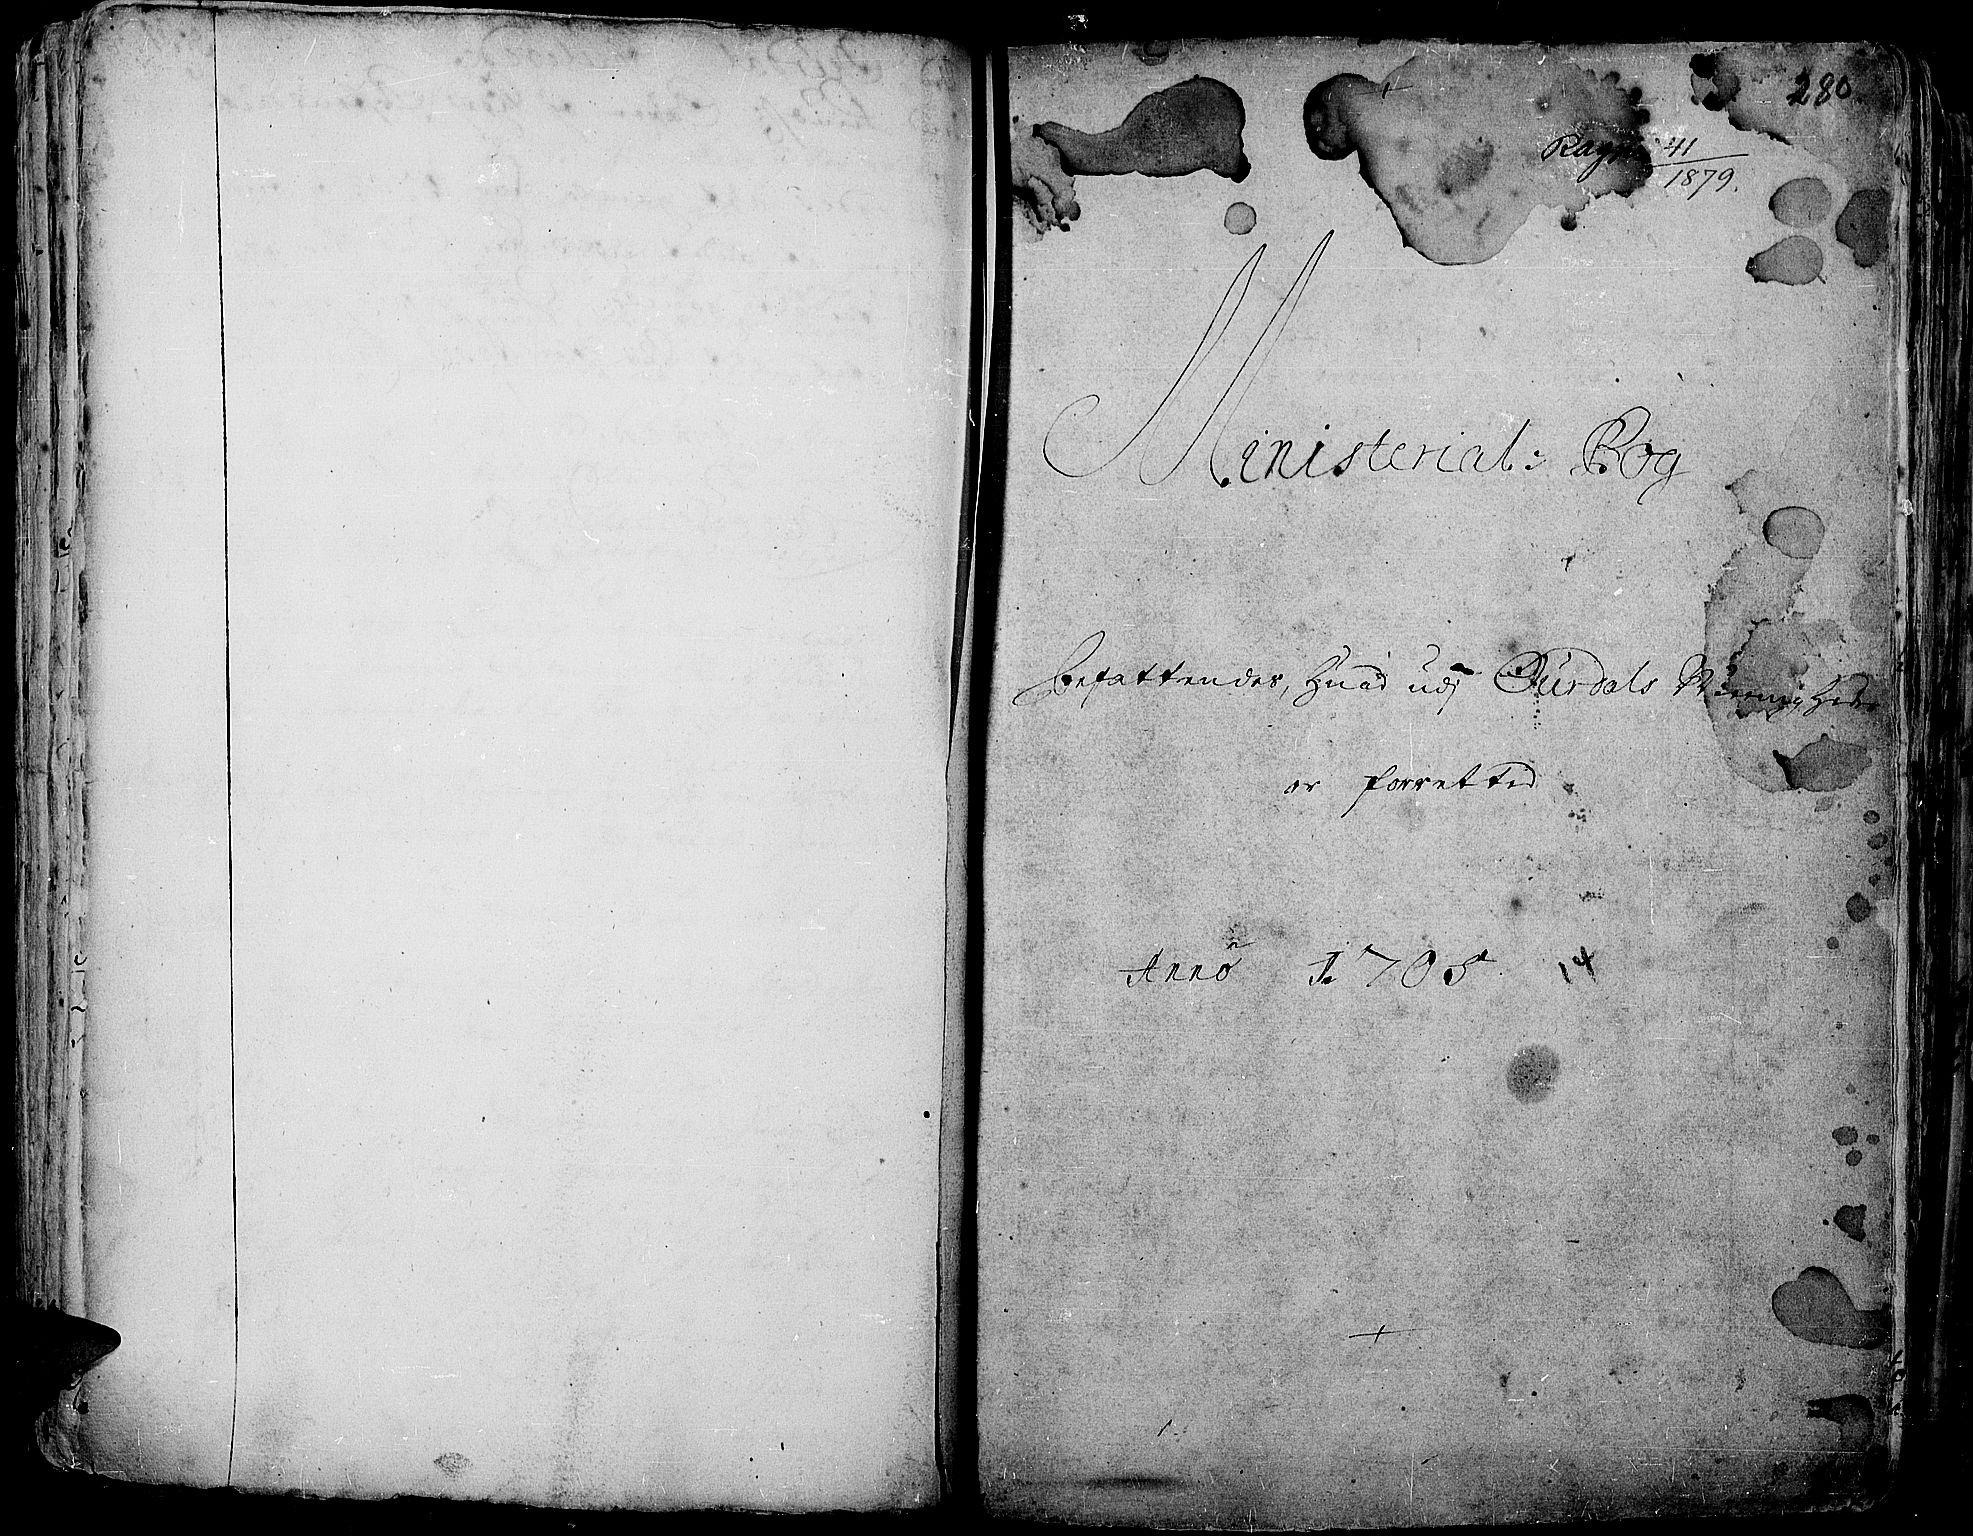 SAH, Aurdal prestekontor, Ministerialbok nr. 1-3, 1692-1730, s. 280